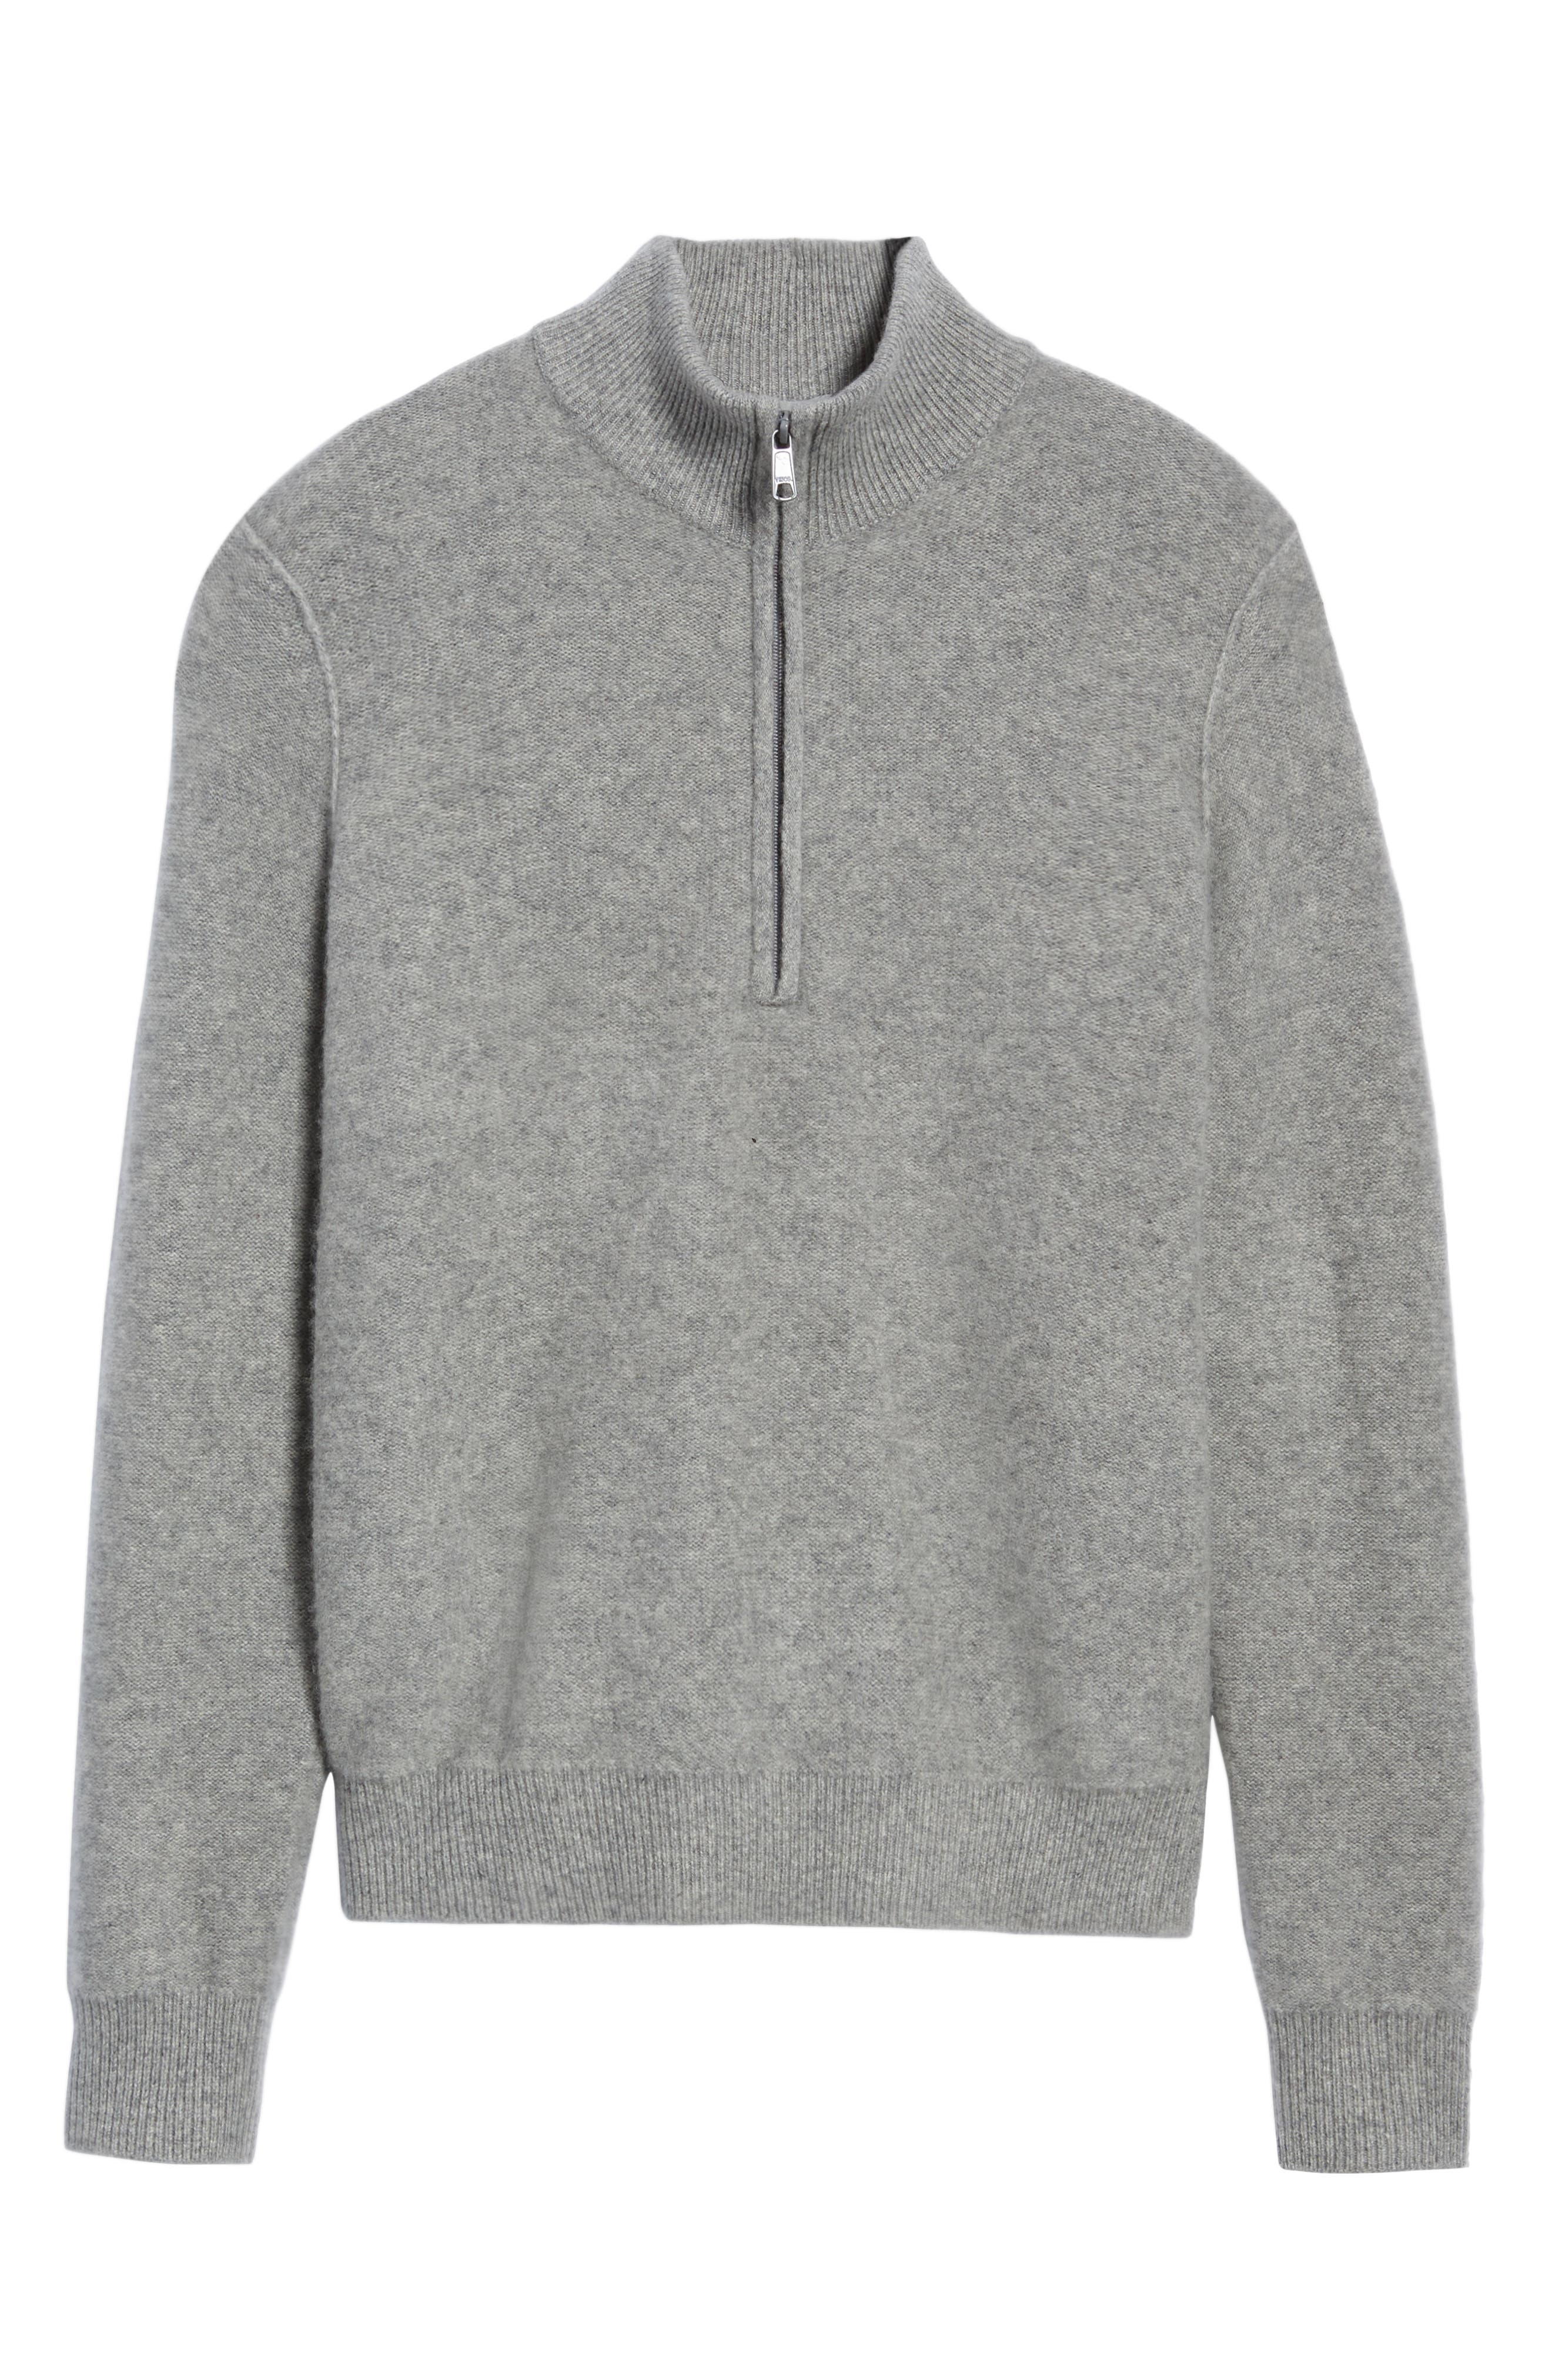 Cashmere Quarter Zip Sweater,                             Alternate thumbnail 6, color,                             H GREY